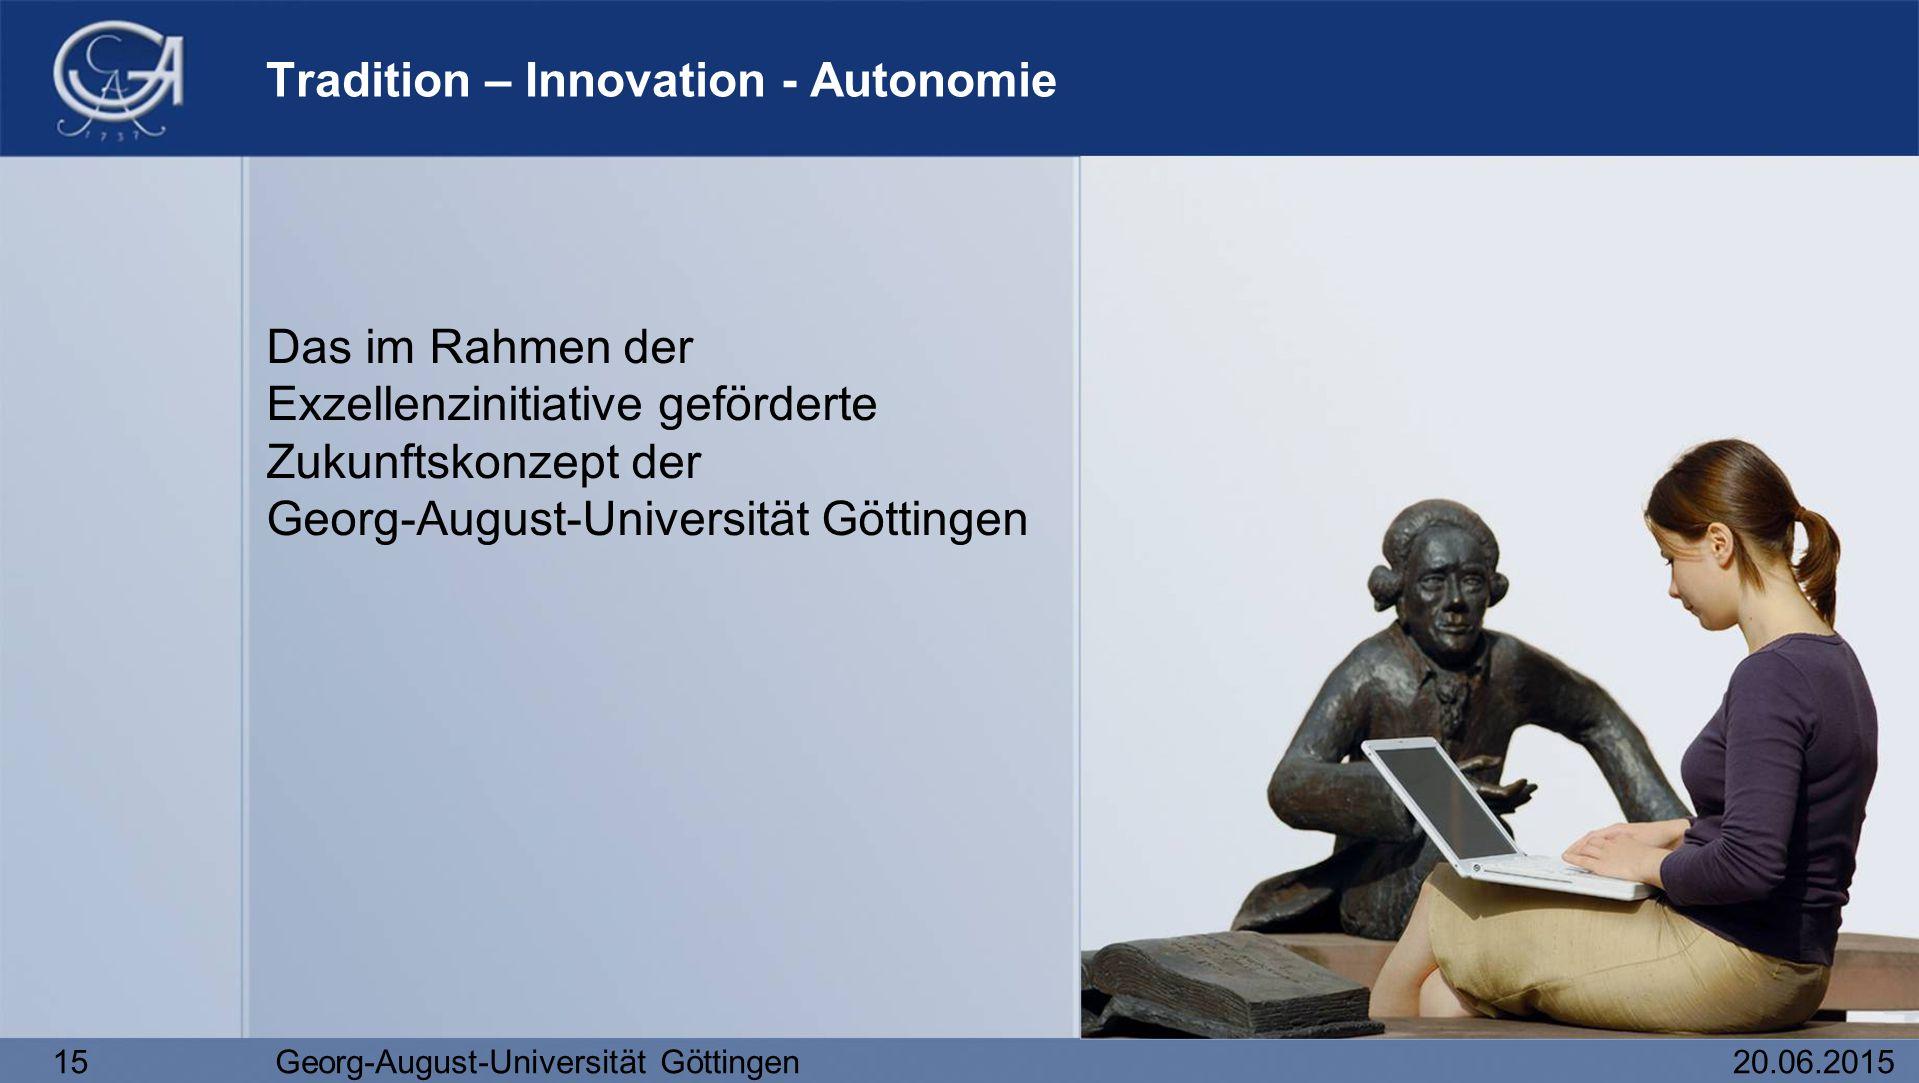 Tradition – Innovation - Autonomie